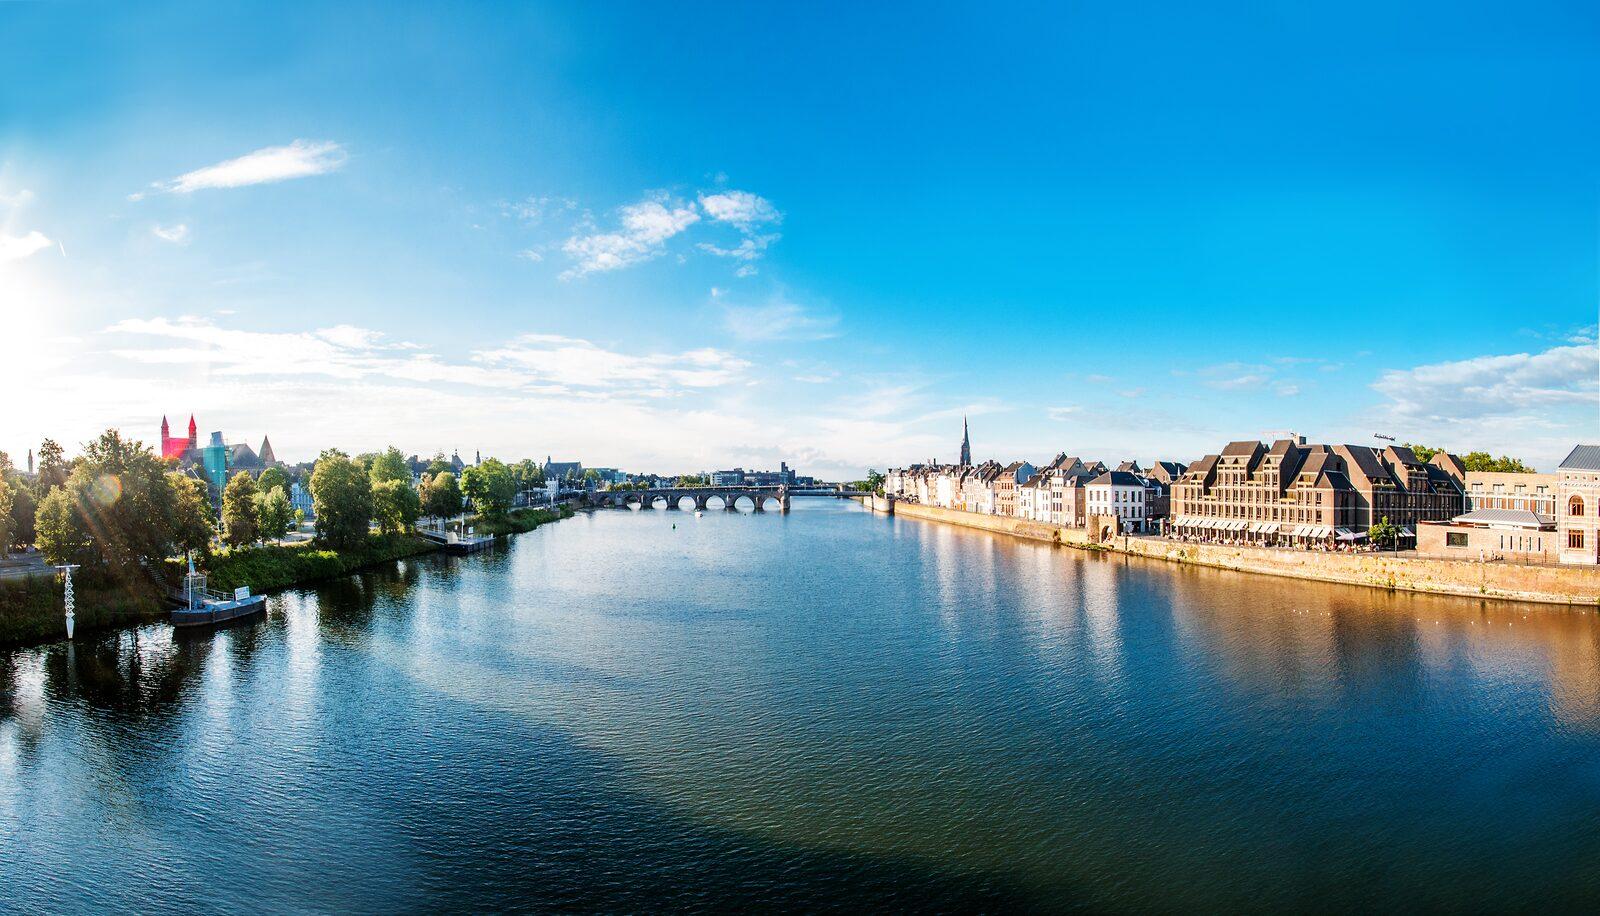 Holiday resort Maastricht